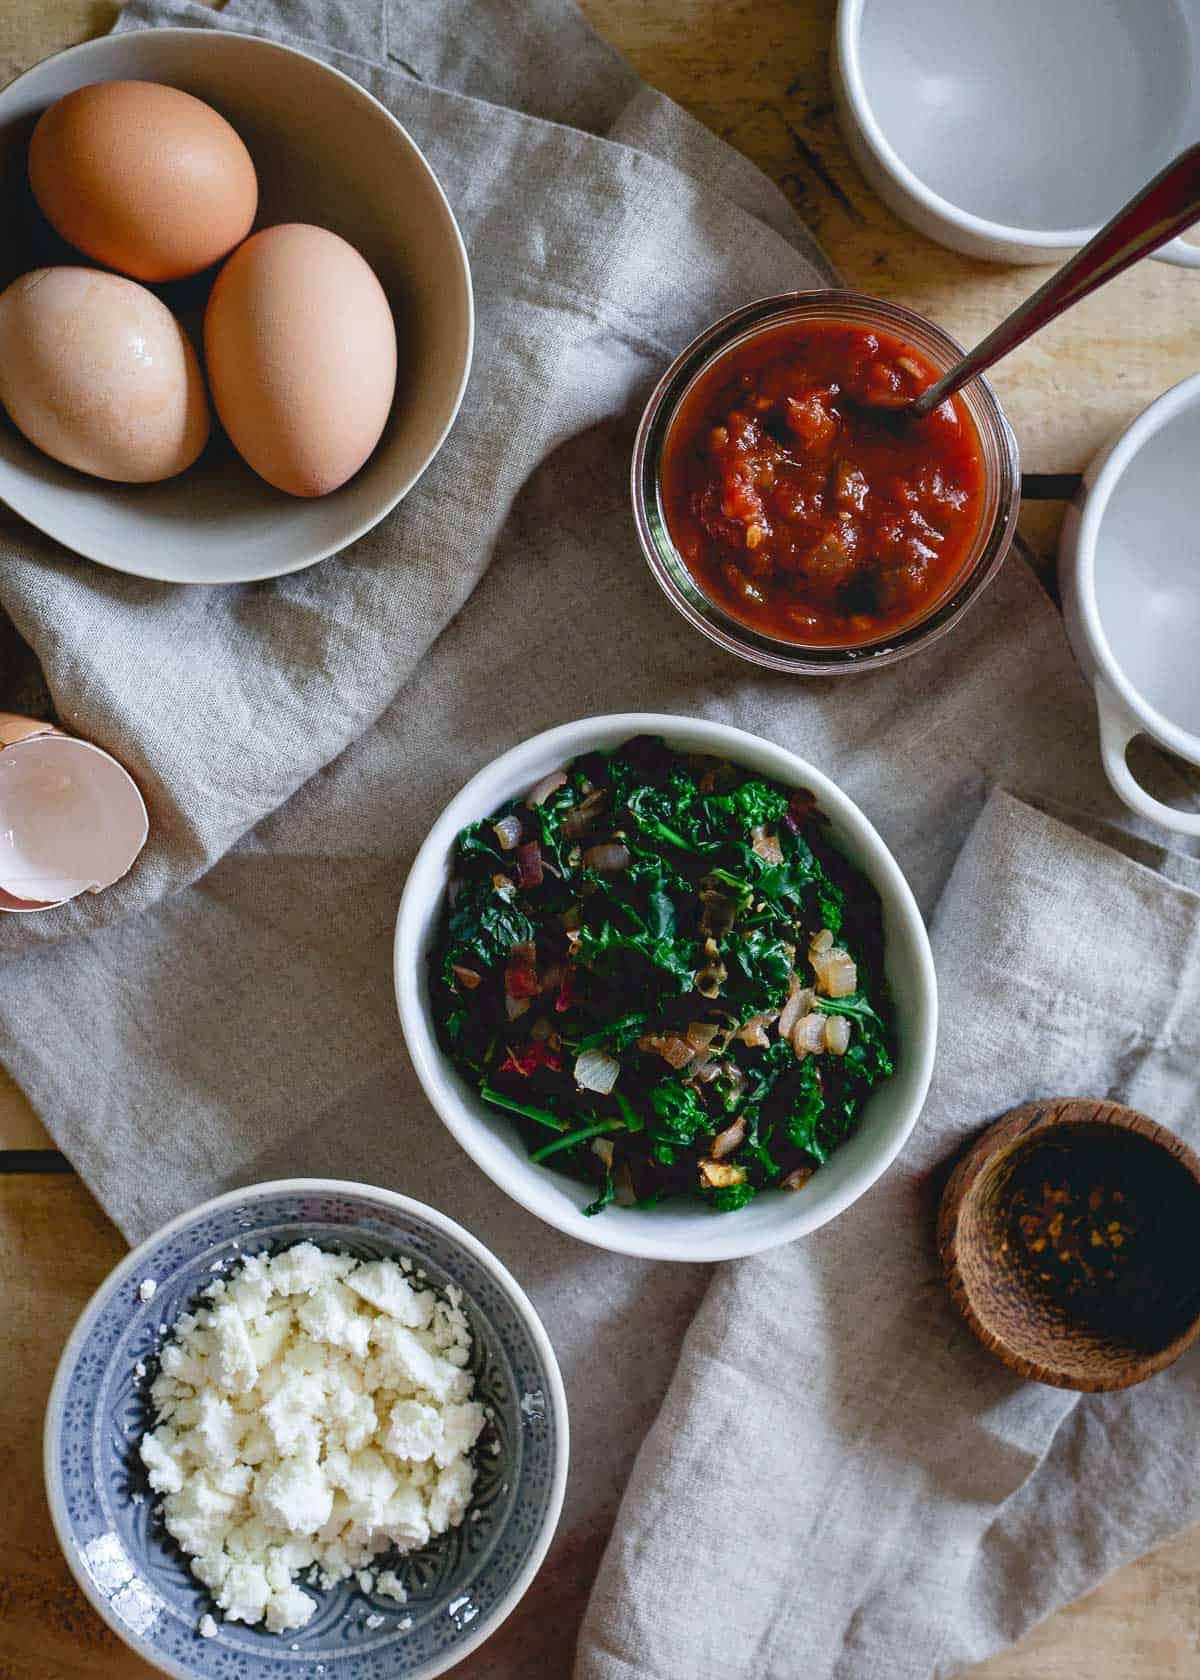 Simple ingredients make this kale feta egg bake an easy weeknight dinner option.